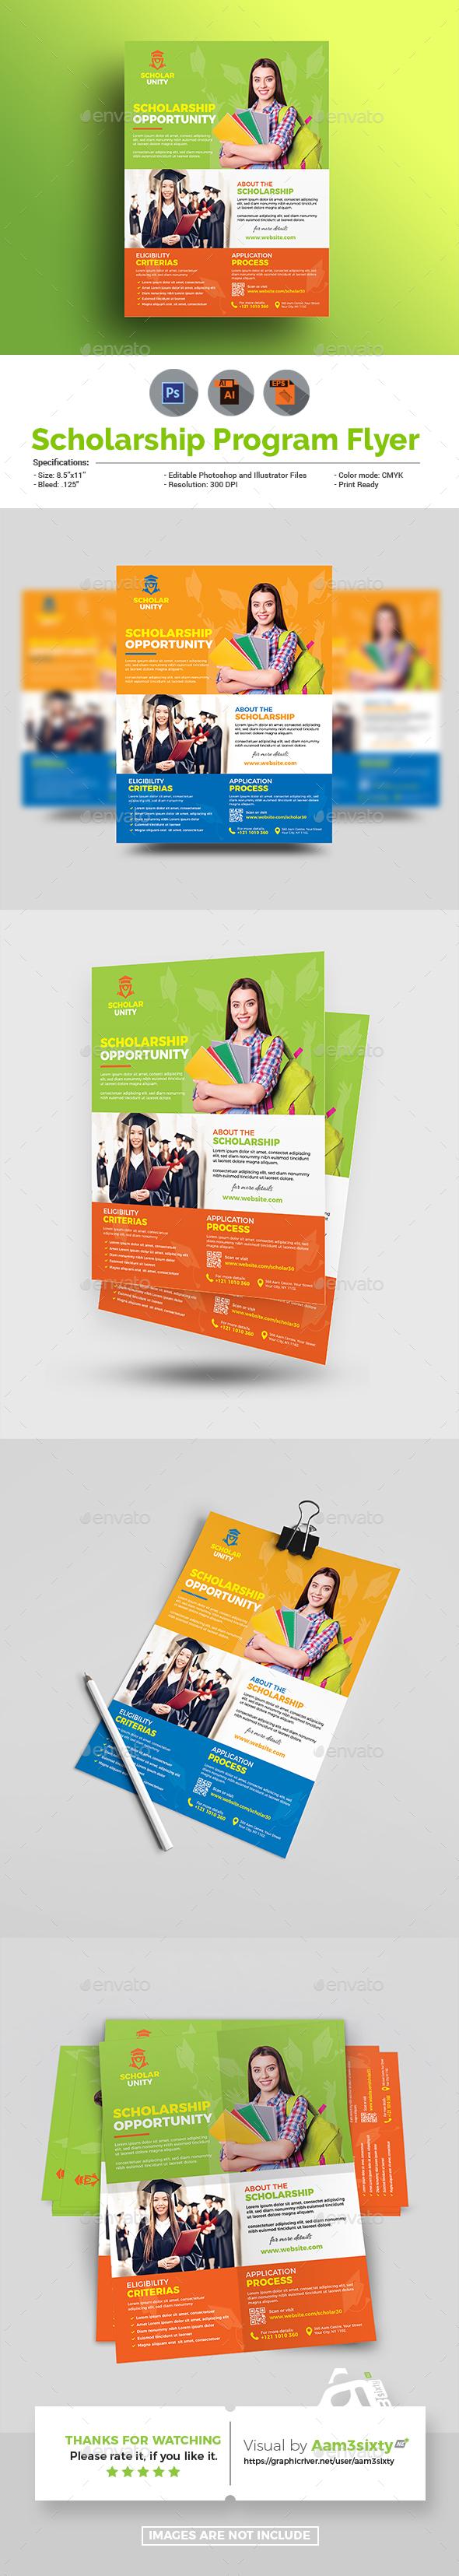 Scholarship Flyer Graphics Designs Templates